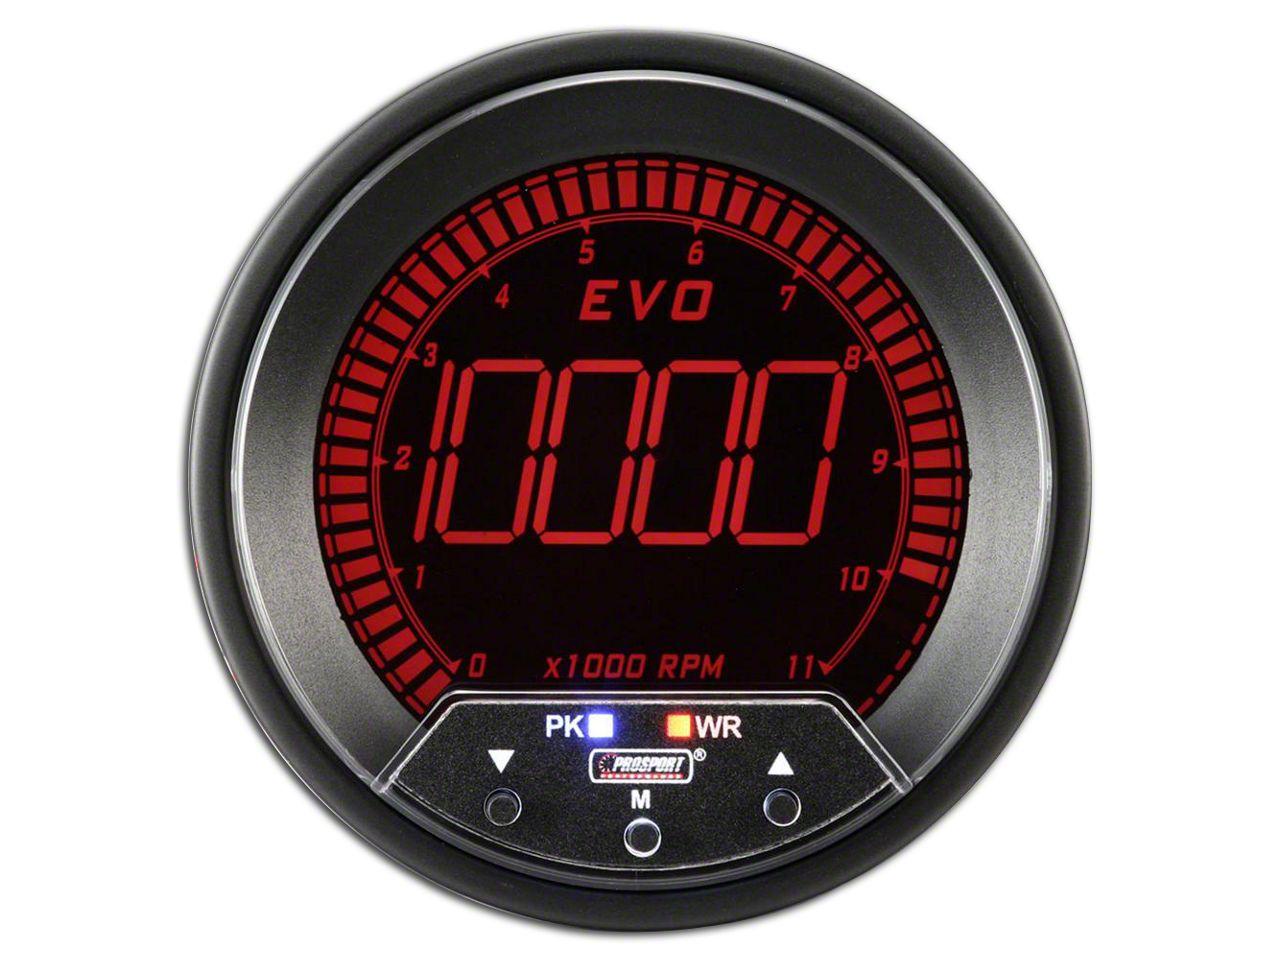 Prosport Quad Color Evo Tachometer - 85mm (97-18 Jeep Wrangler TJ, JK & JL)